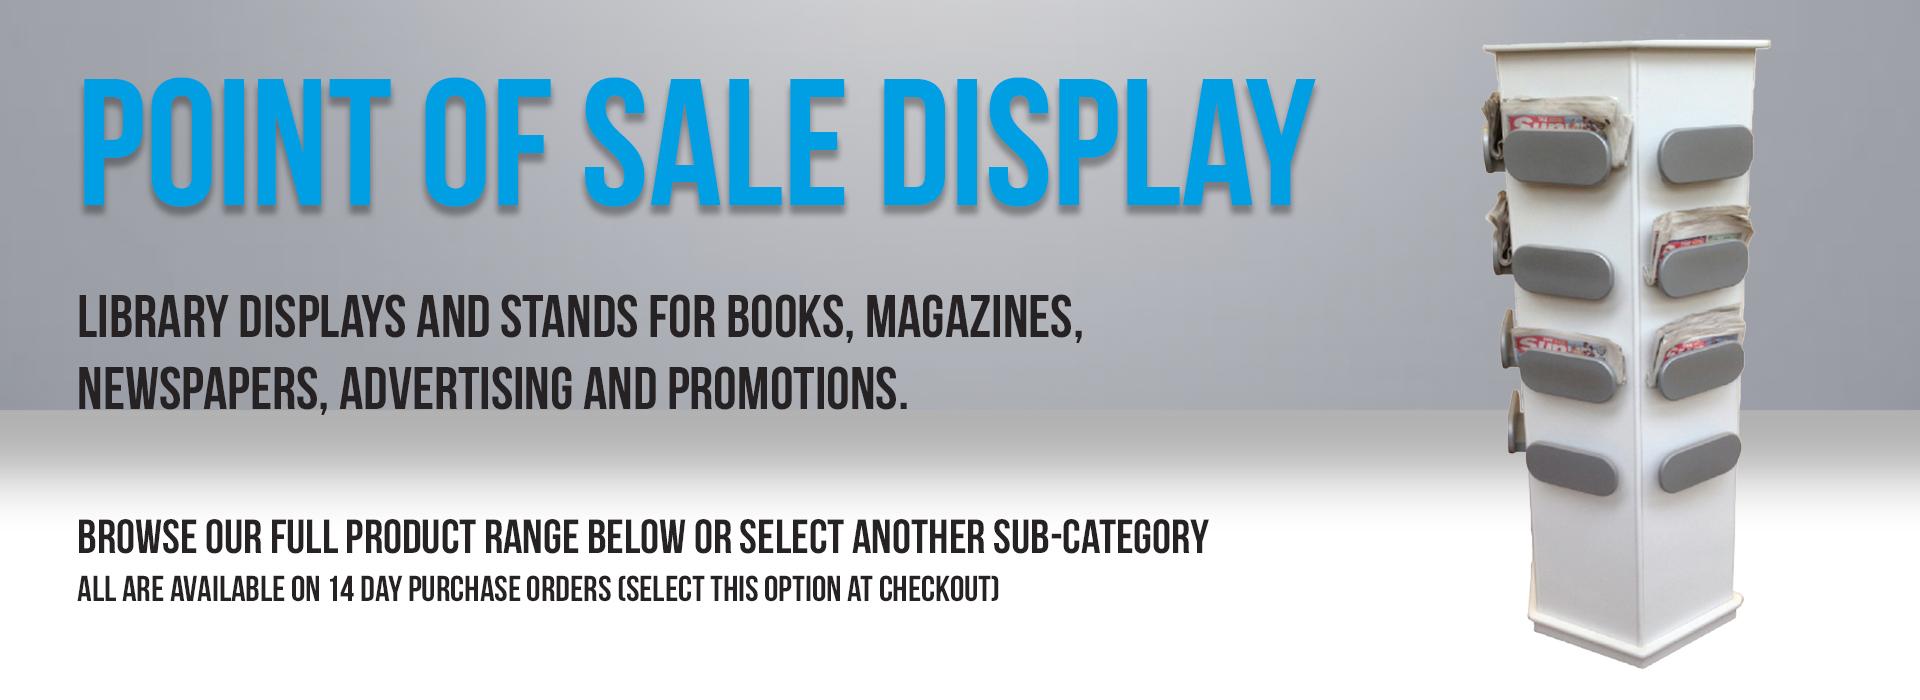 point-of-sale-display-banner.jpg